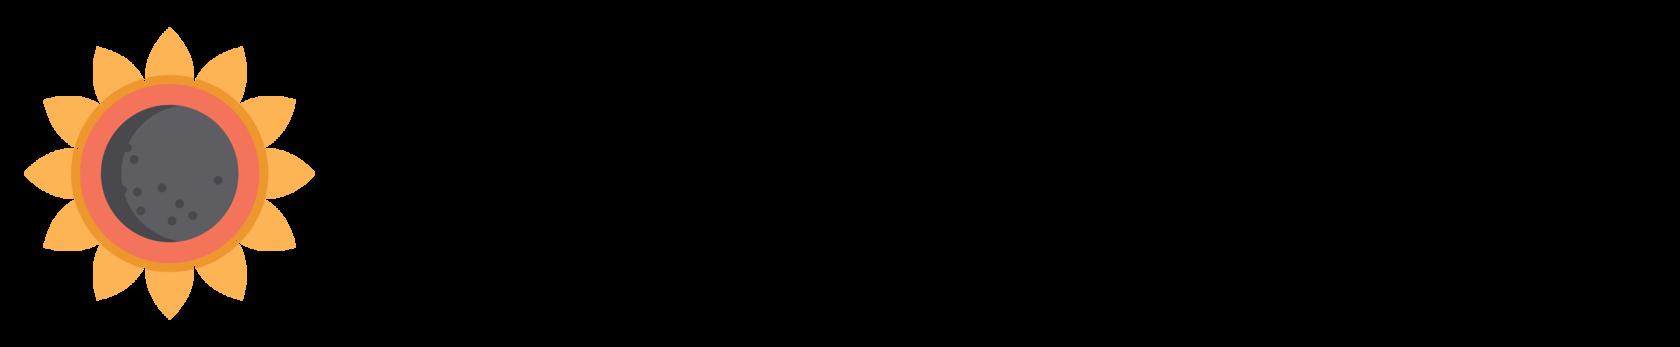 Подсолнухи